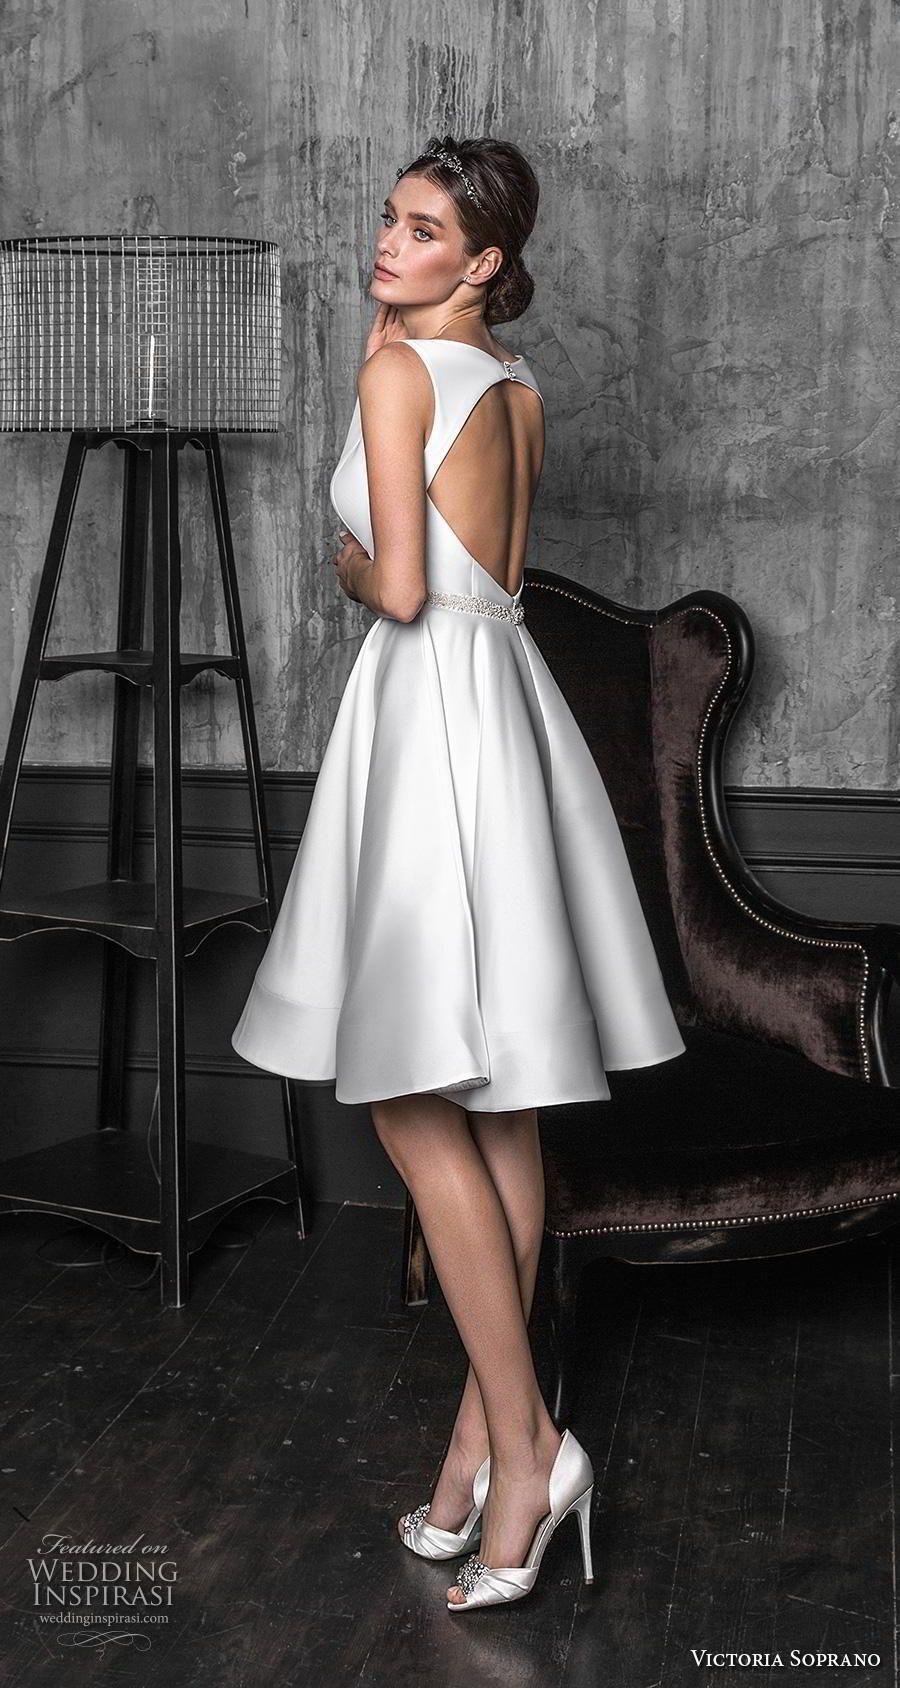 Victoria Soprano 2020 Wedding Dresses Chic Royal Bridal Collection Wedding Inspirasi Knee Length Wedding Dress Short Wedding Dress 2020 Wedding Dresses [ 1688 x 900 Pixel ]